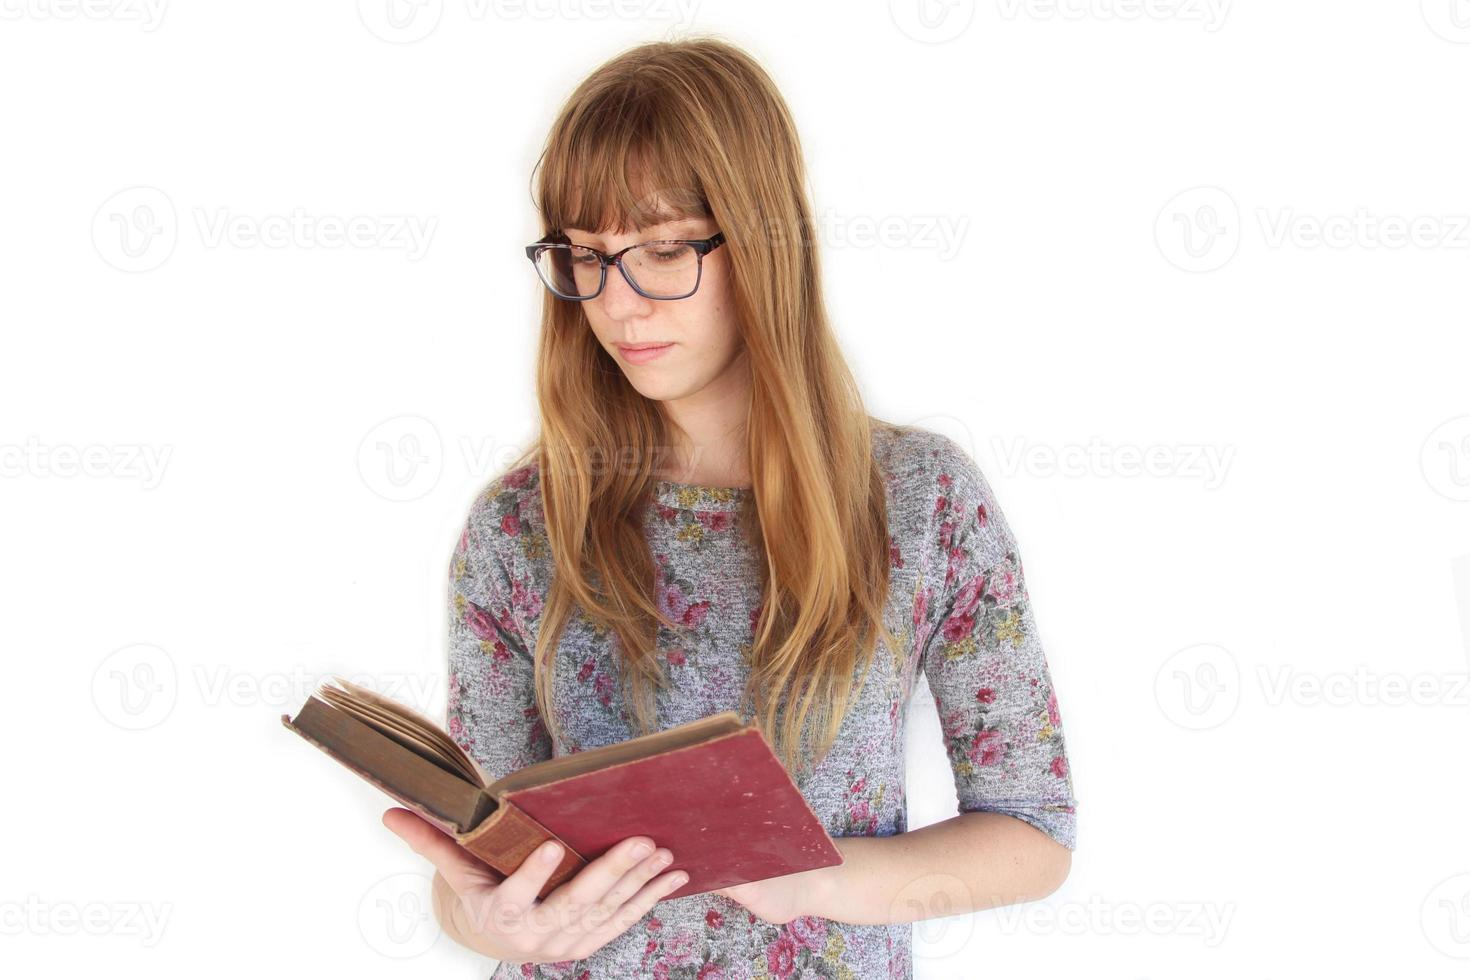 livre de lecture adolescente photo